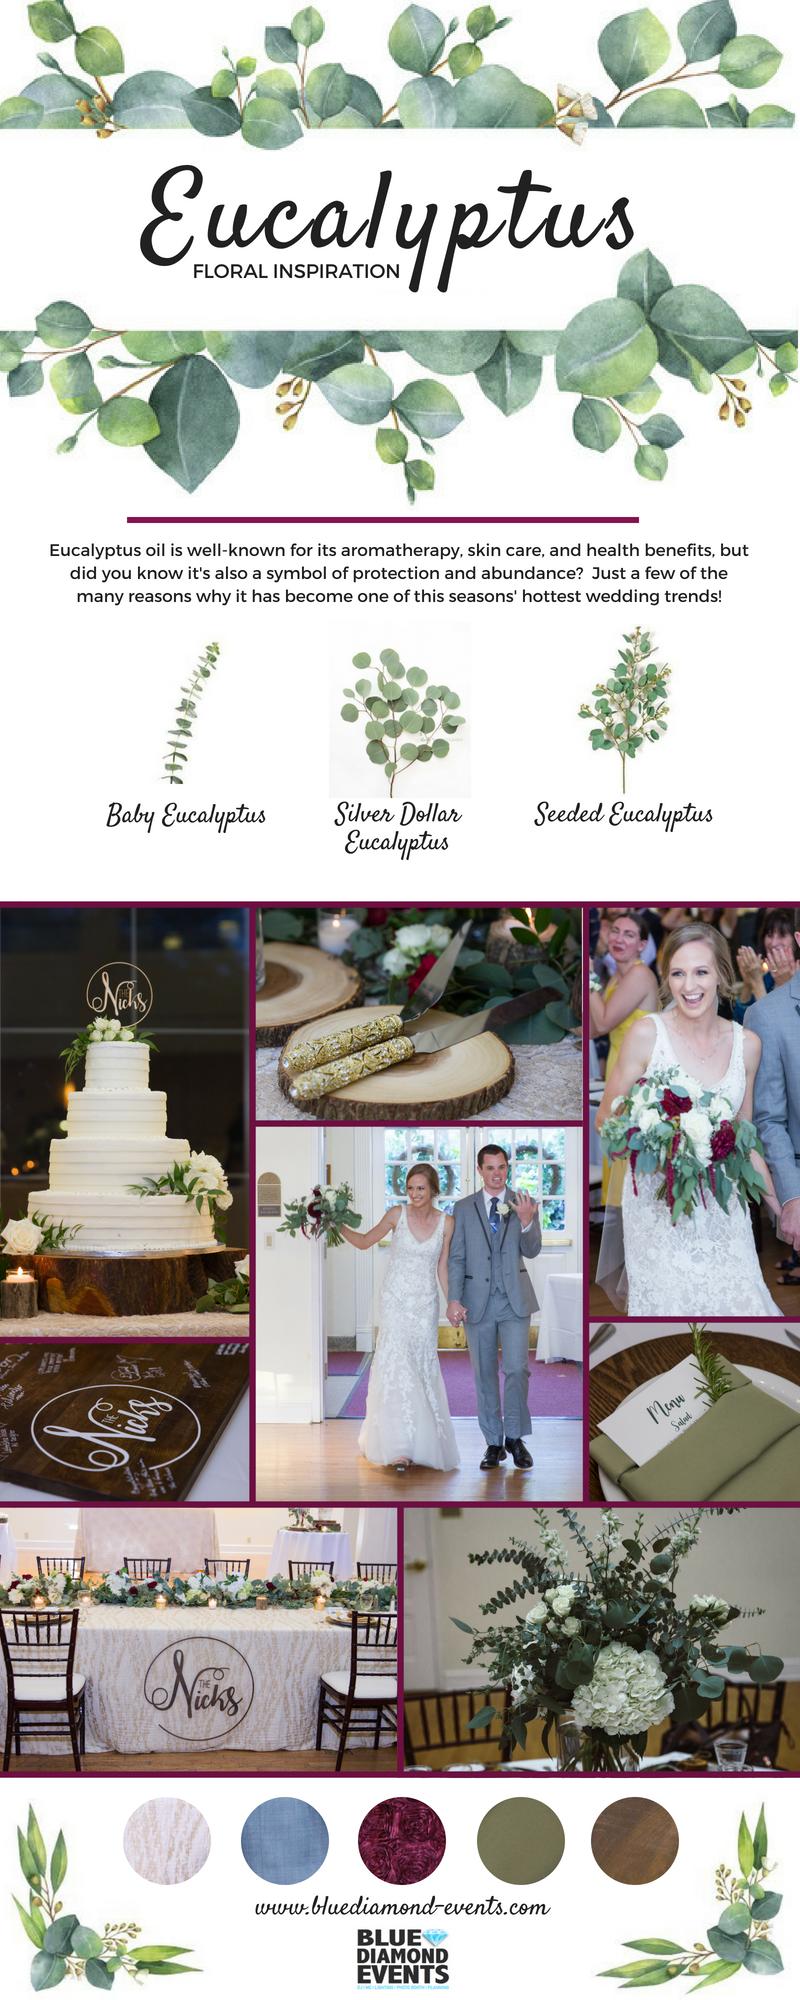 eucalyptus inspiration wedding floral decor columbia mo missouri planning and coordinating wedding planner photography photographer photos table decor centerpiece ideas